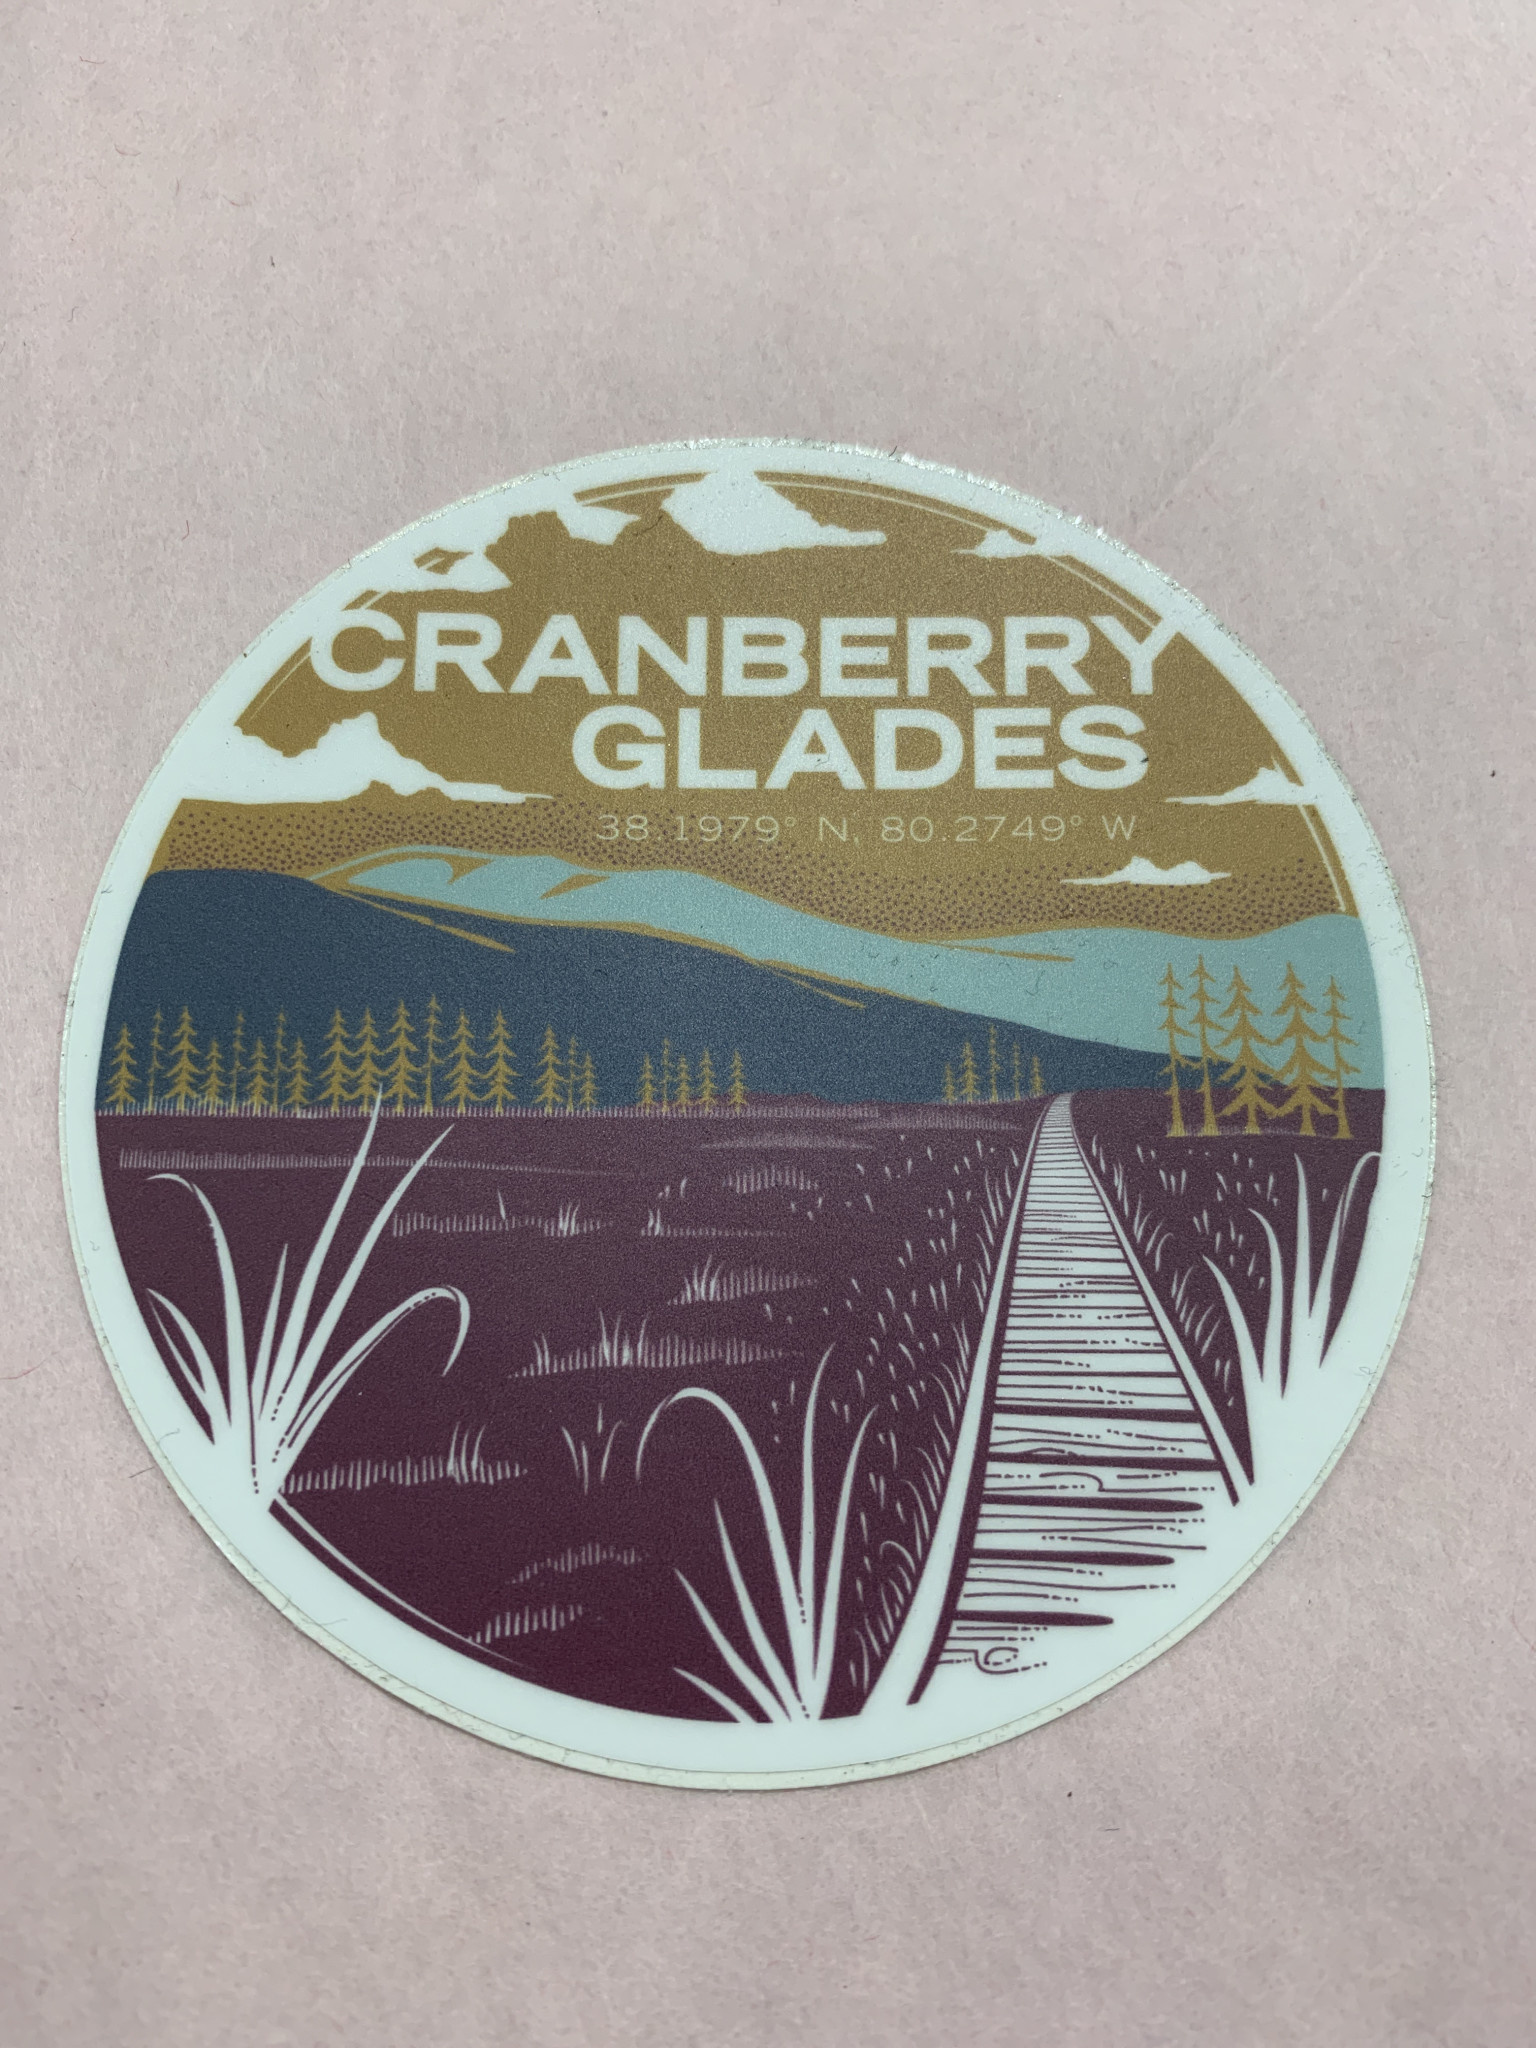 Wild & Wonderful Lifestyle Company Cranberry glades Sticker